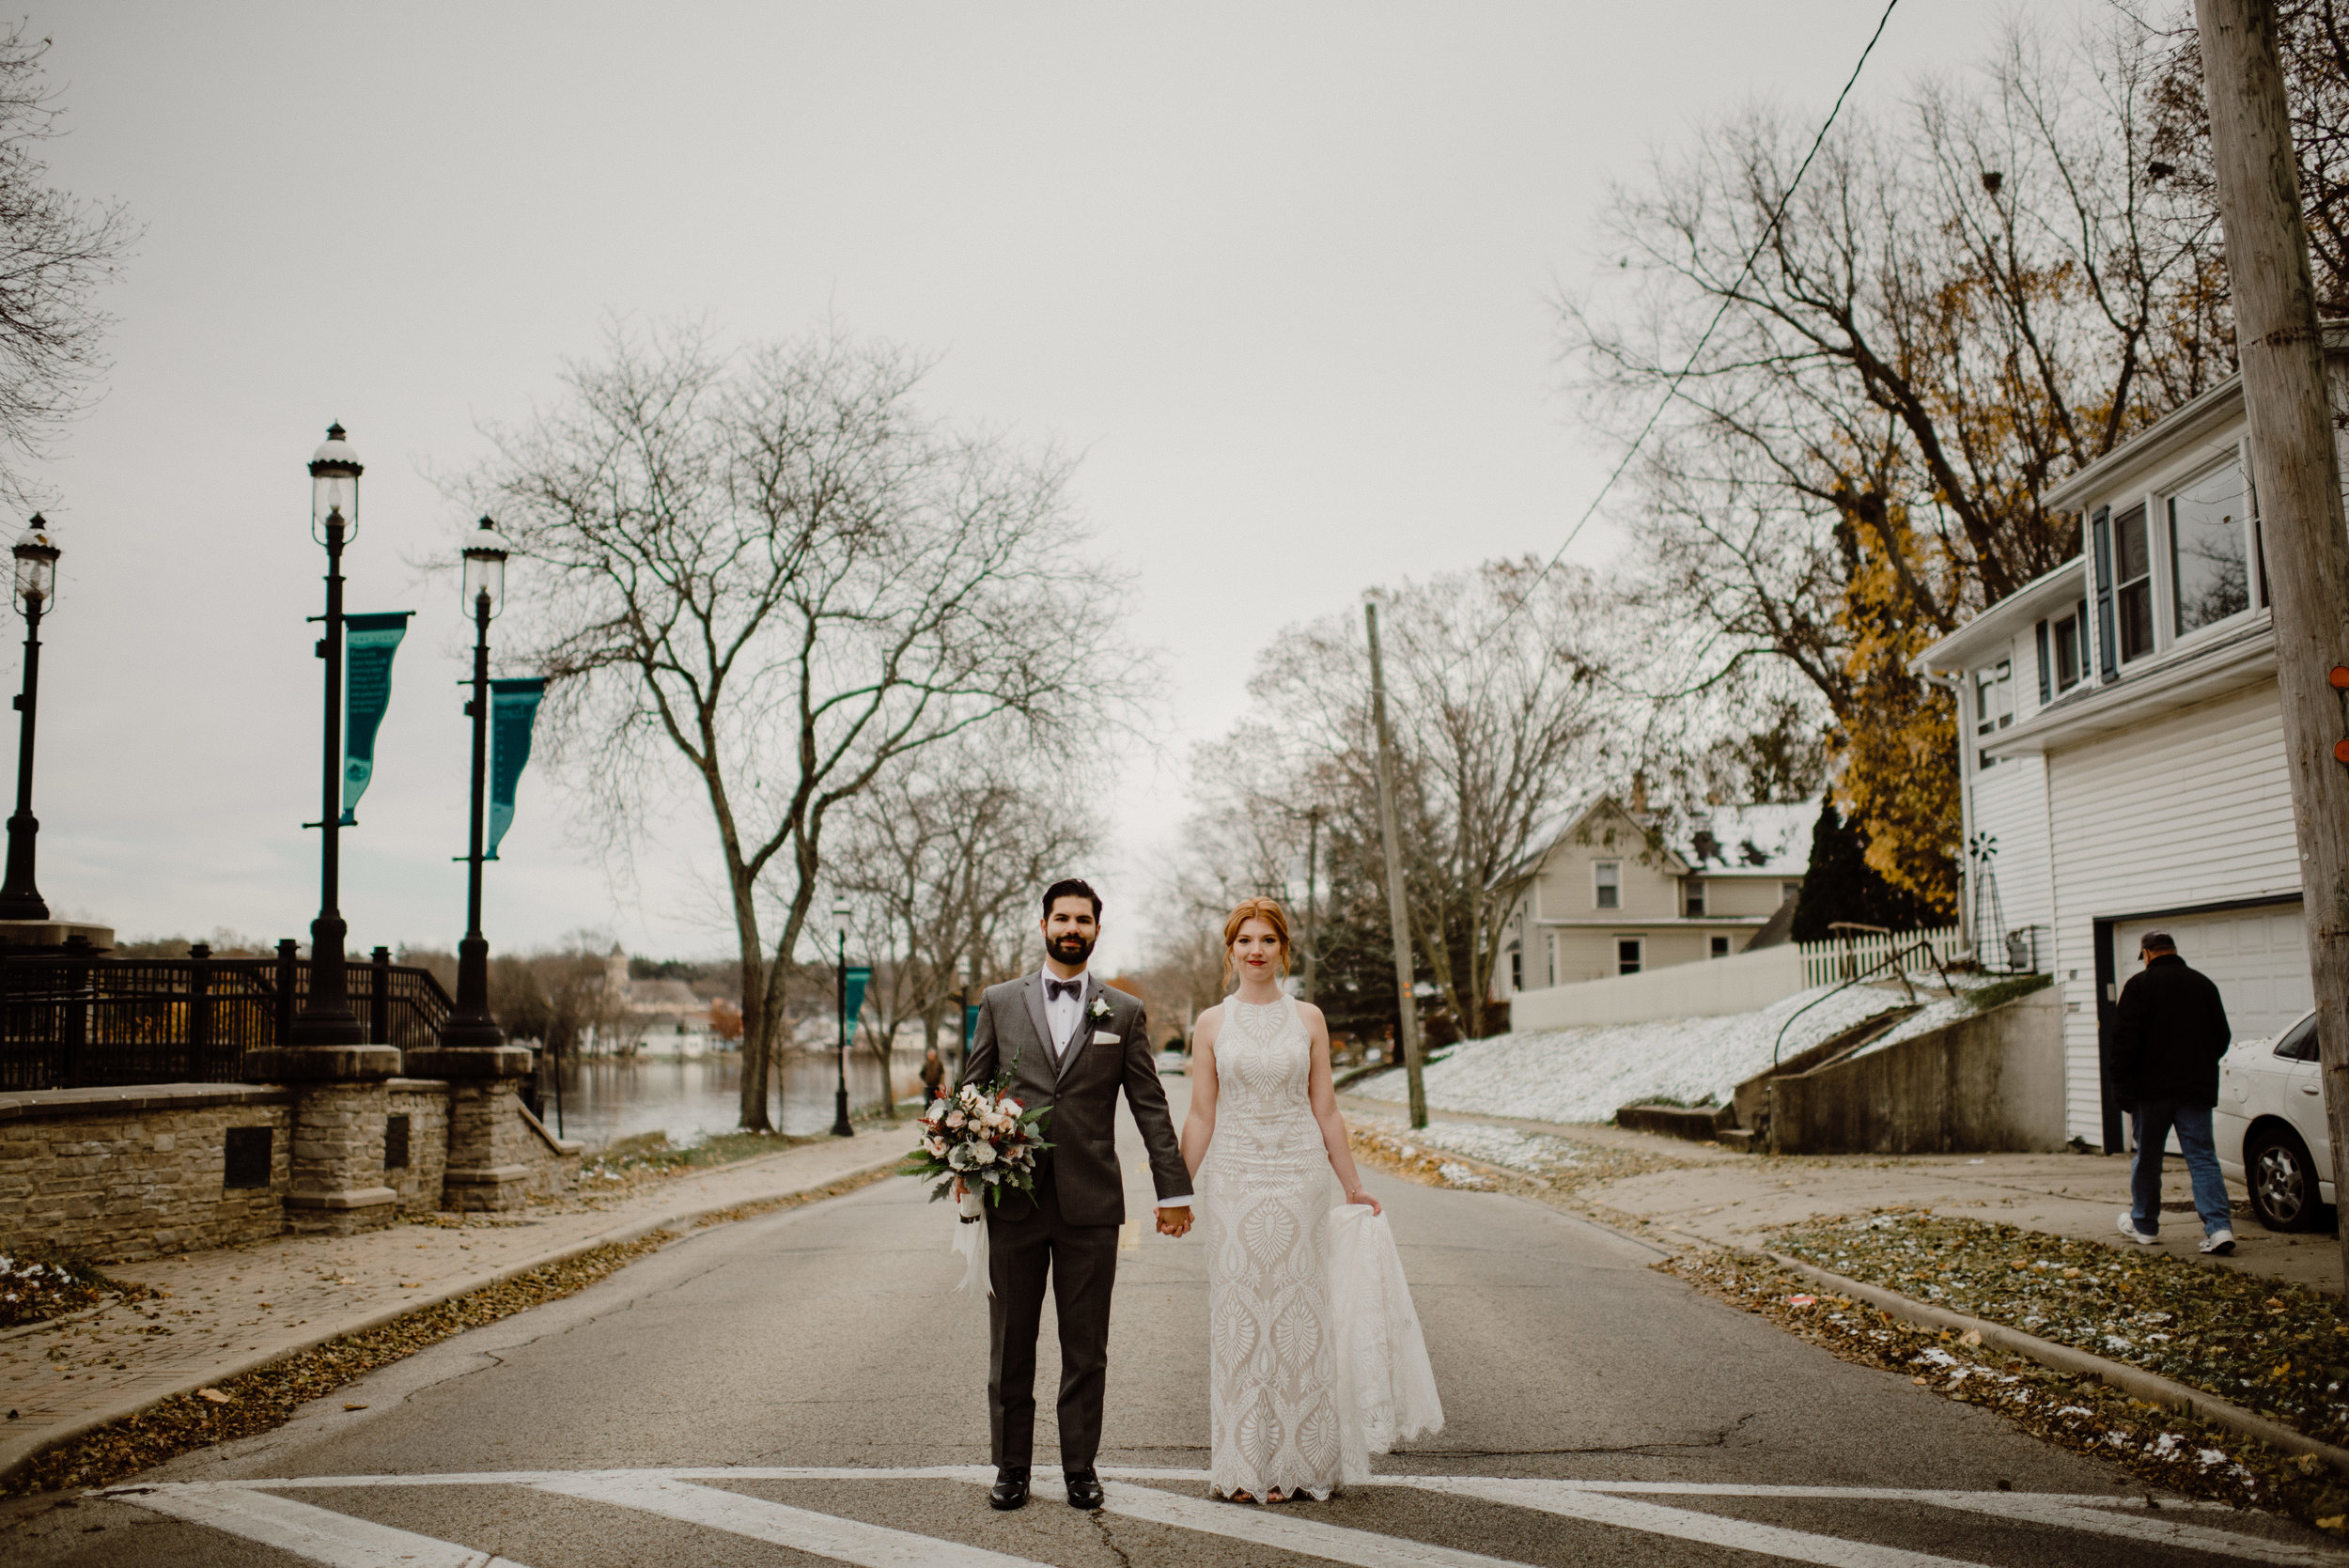 The Brix on Fox, Chicago Wedding Photographer, Zach and Rosalie00037.jpg